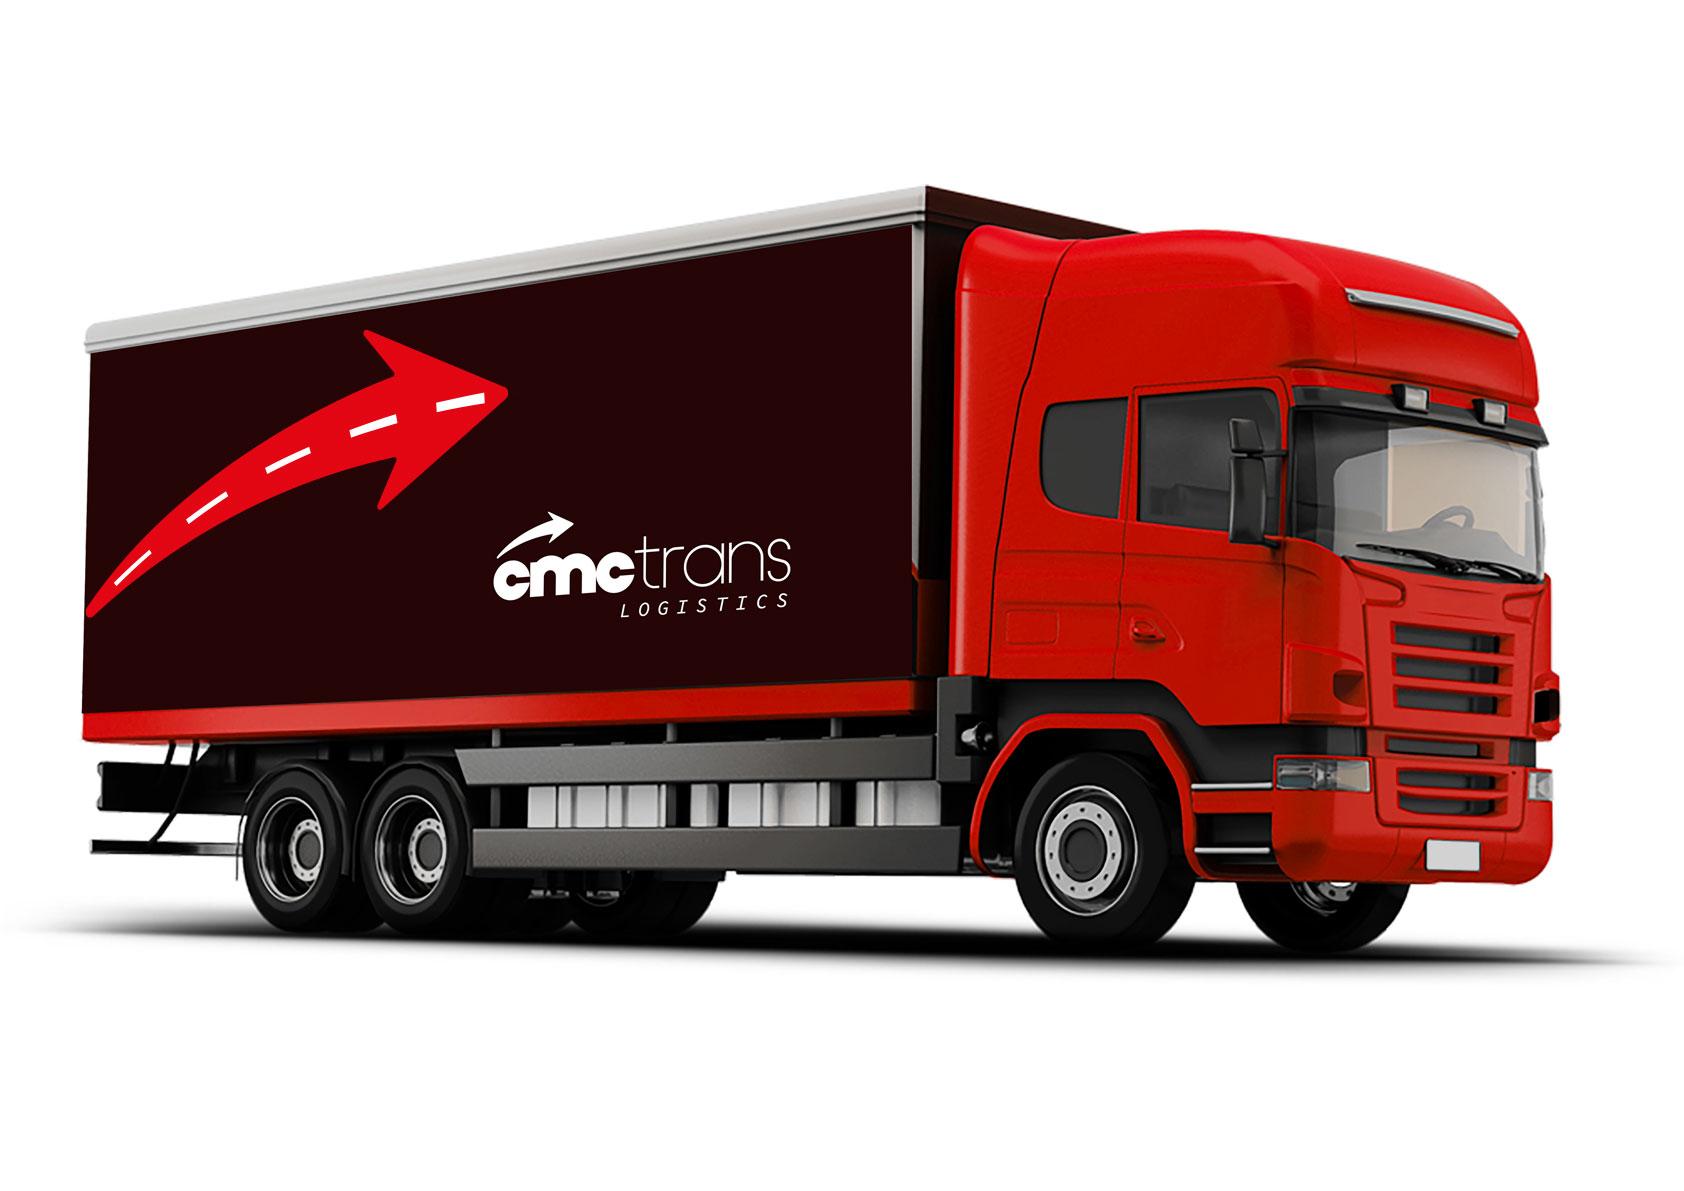 cmctrans-logo-camion